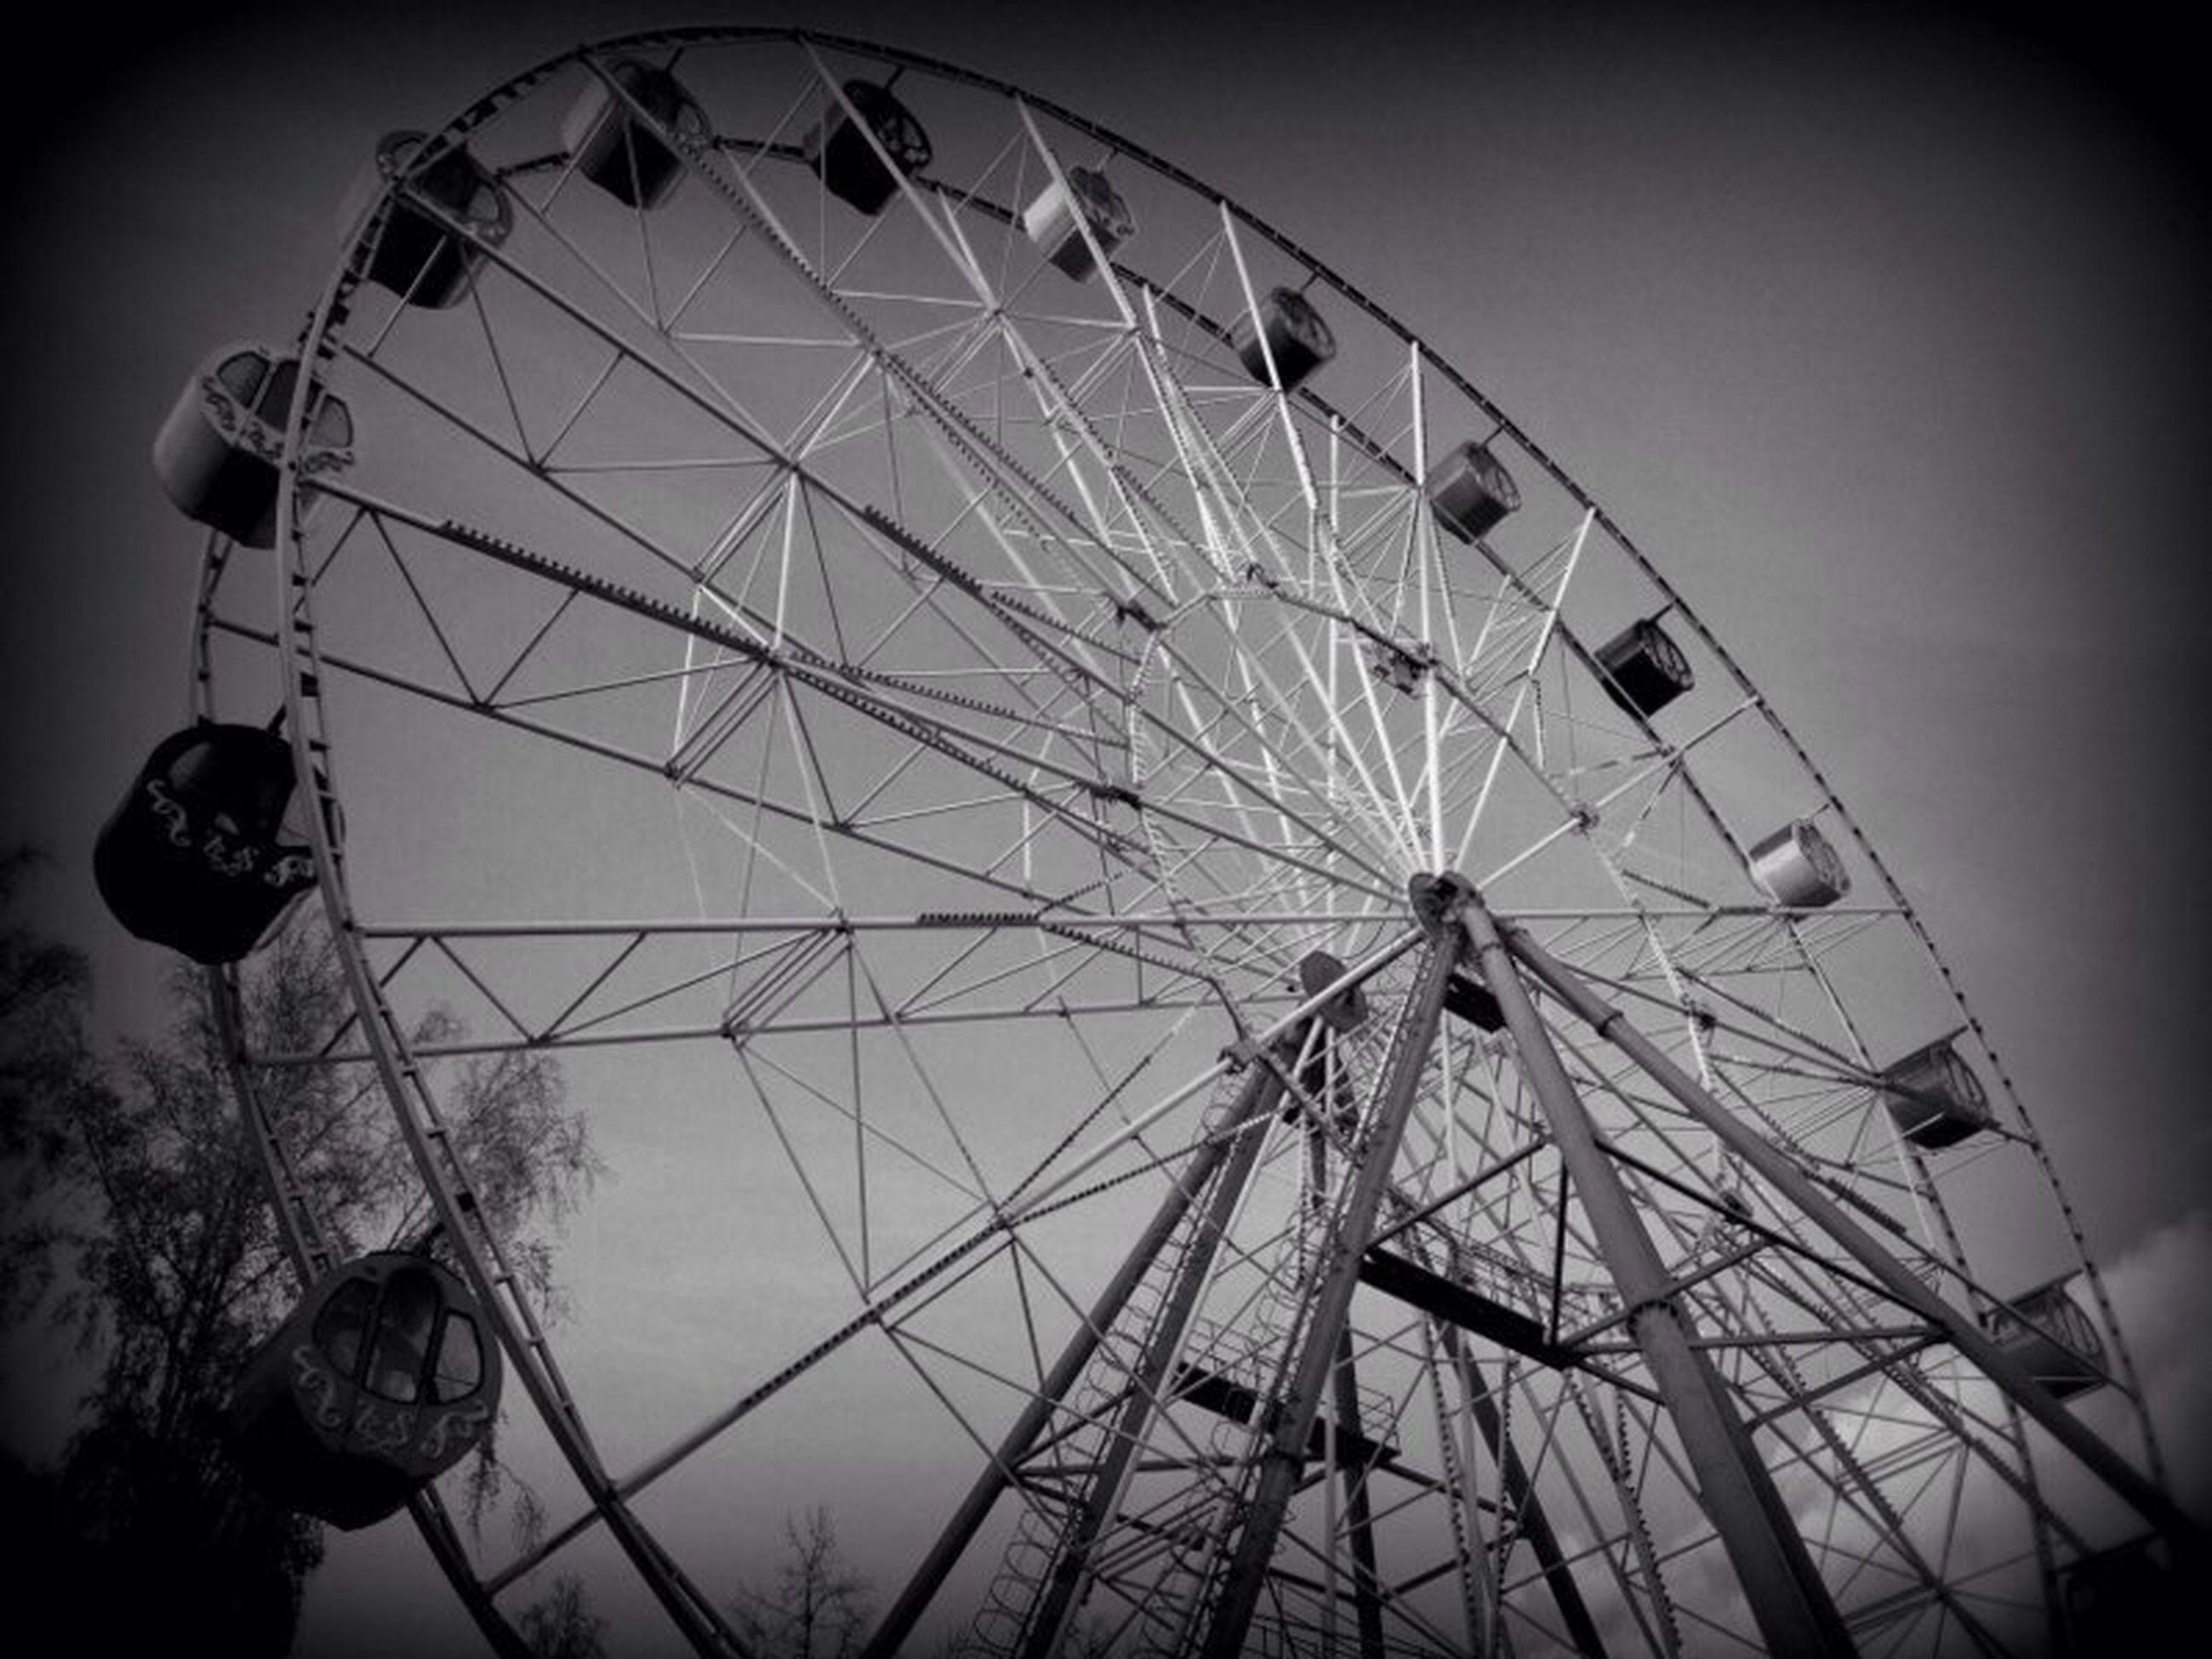 amusement park, amusement park ride, ferris wheel, arts culture and entertainment, low angle view, sky, leisure activity, fun, enjoyment, clear sky, built structure, outdoors, large, day, umbrella, metal, architecture, fairground ride